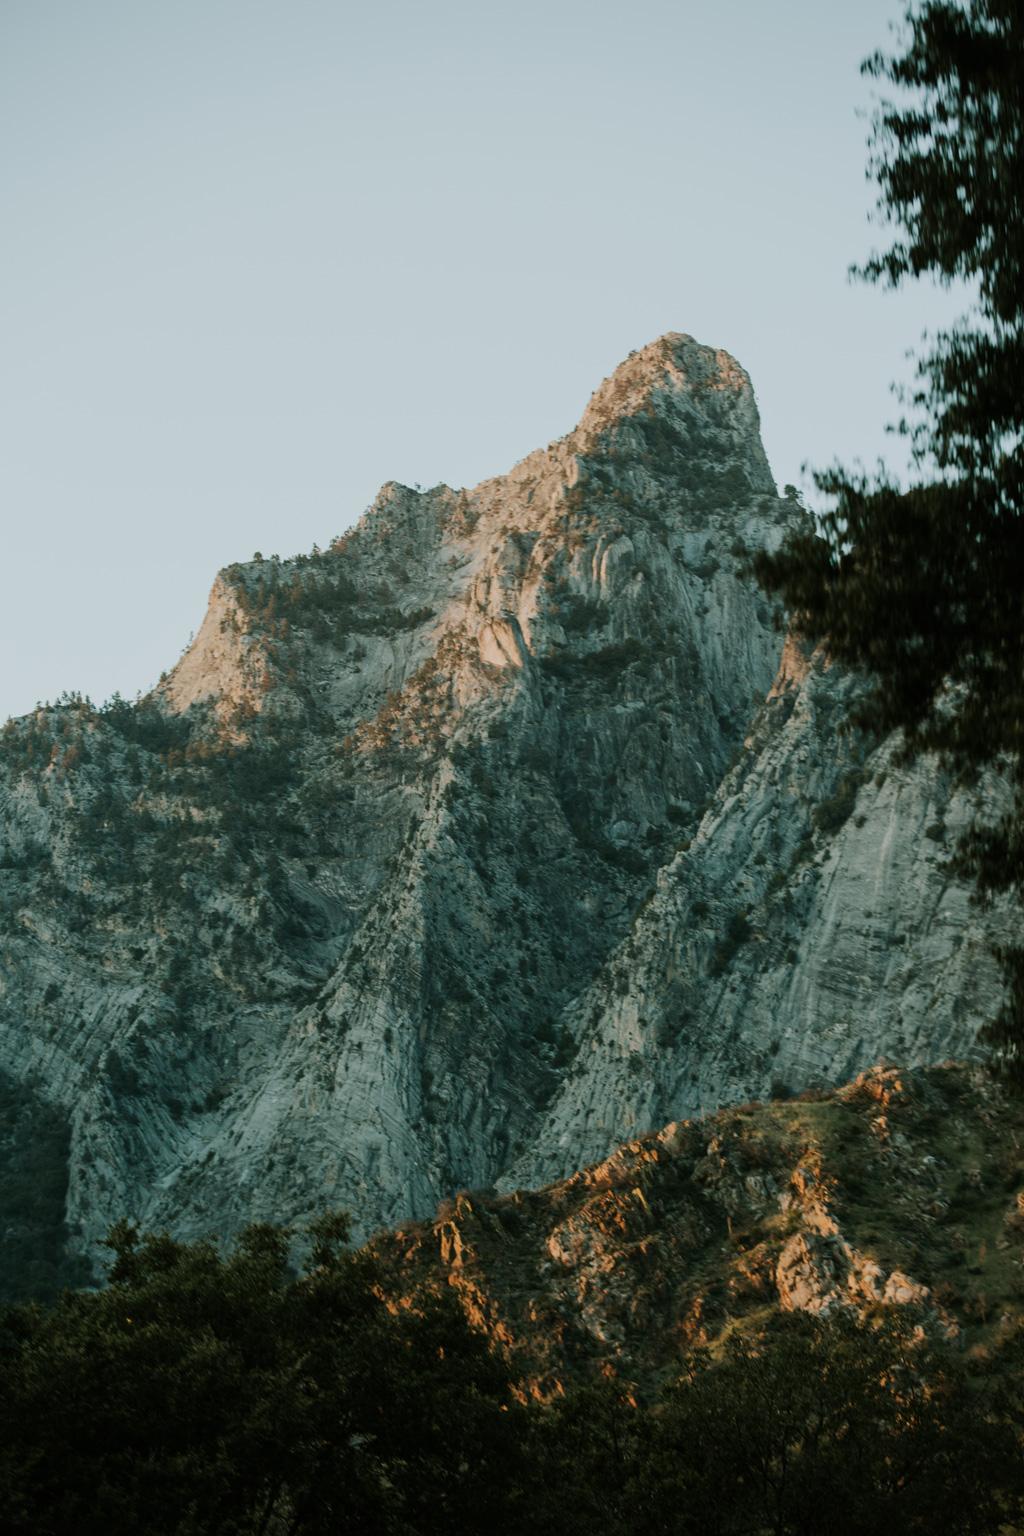 CindyGiovagnoli_Sequoia_KingsCanyon_National_Park_California_roadtrip_travel-007.jpg